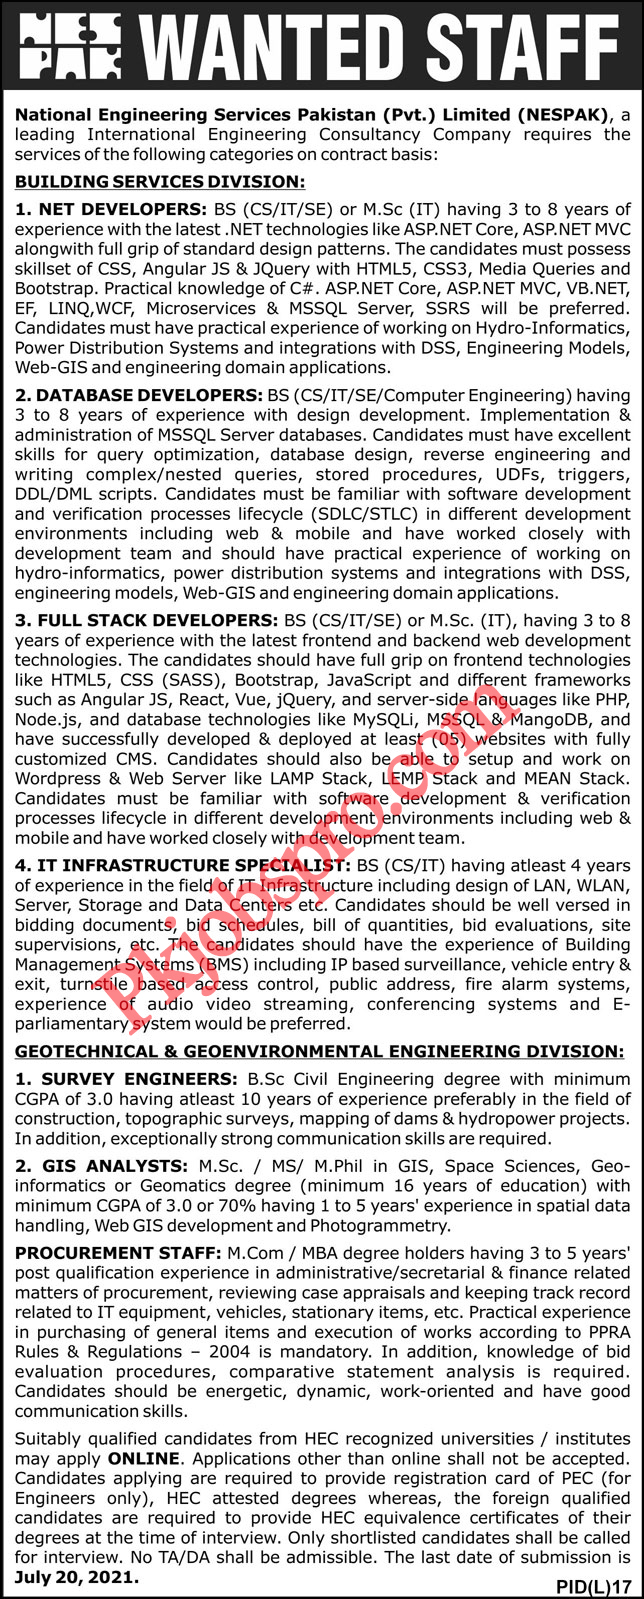 National Engineering Services Pakistan Jobs 2021